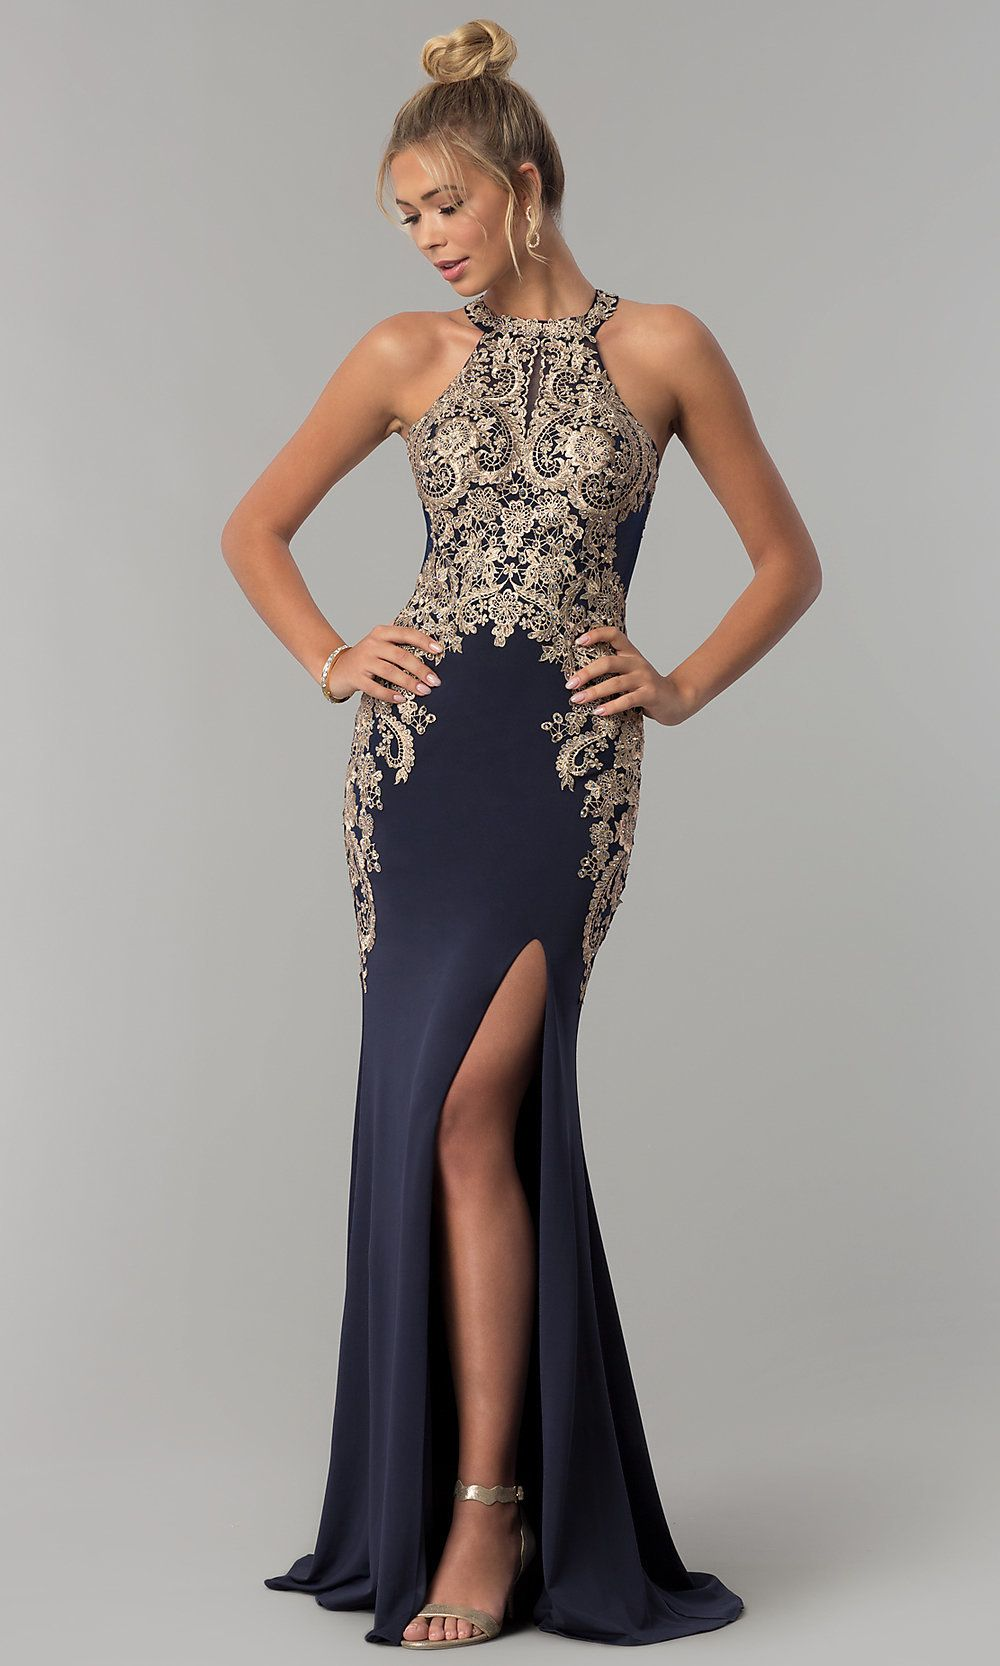 Elizabeth K Prom Dress with Lace Bodice